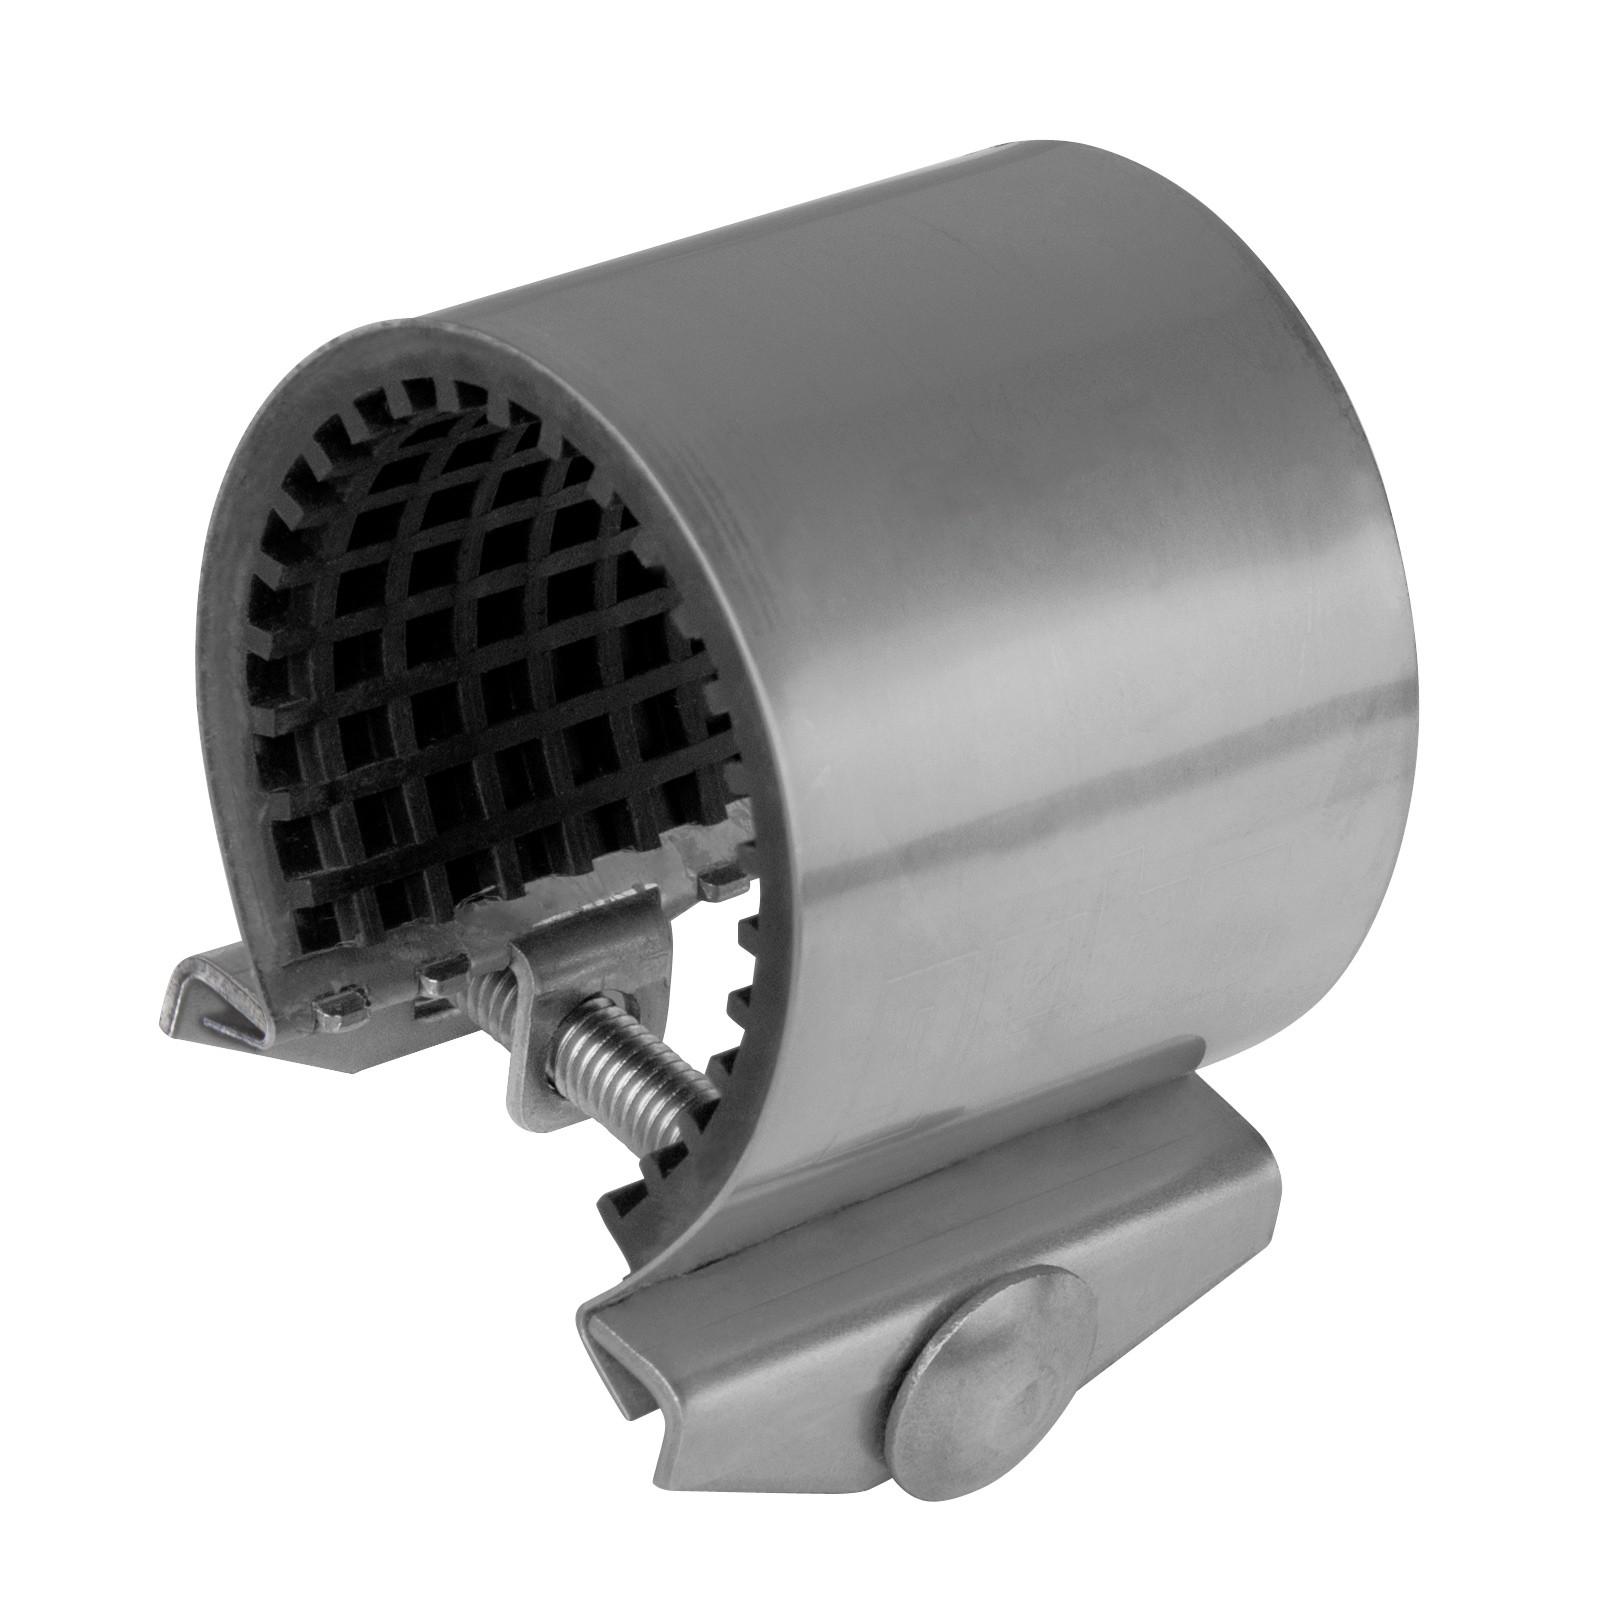 Edelstahl Rohr Dichtband / Dichtschelle 33-37 mm 1 Zoll Unifix